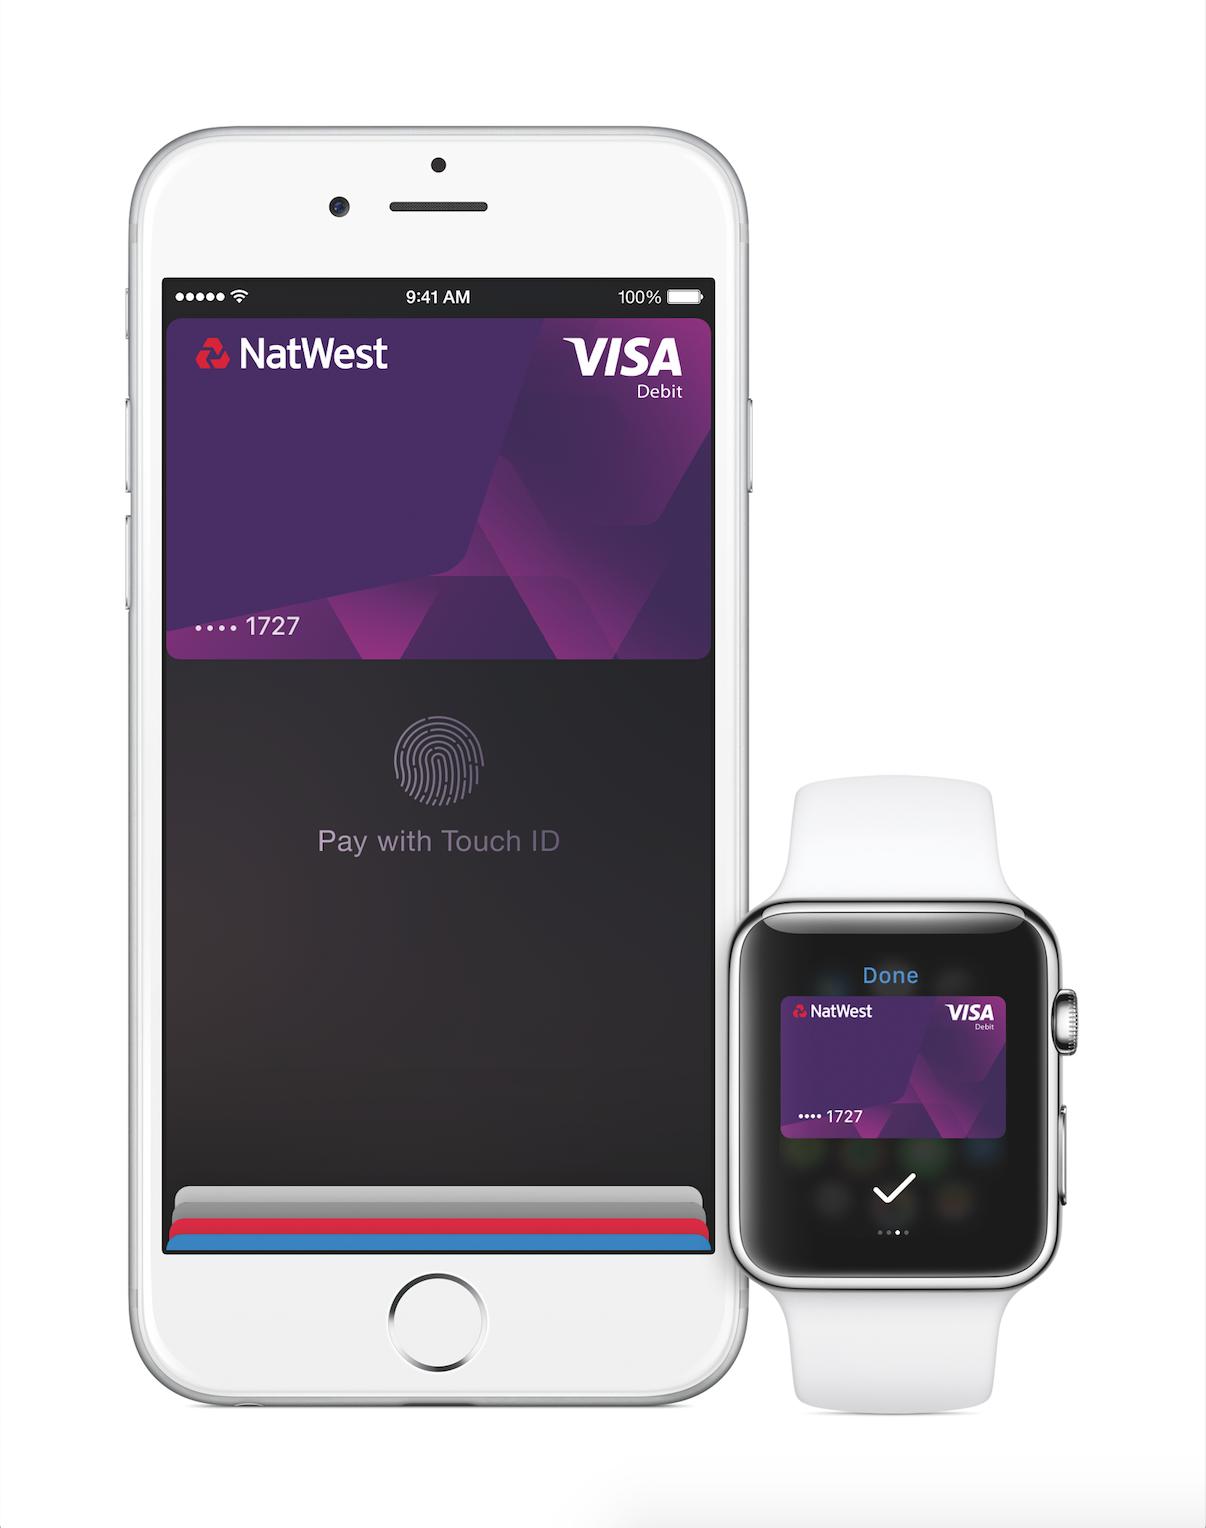 Apple Pay showing Visa debit card